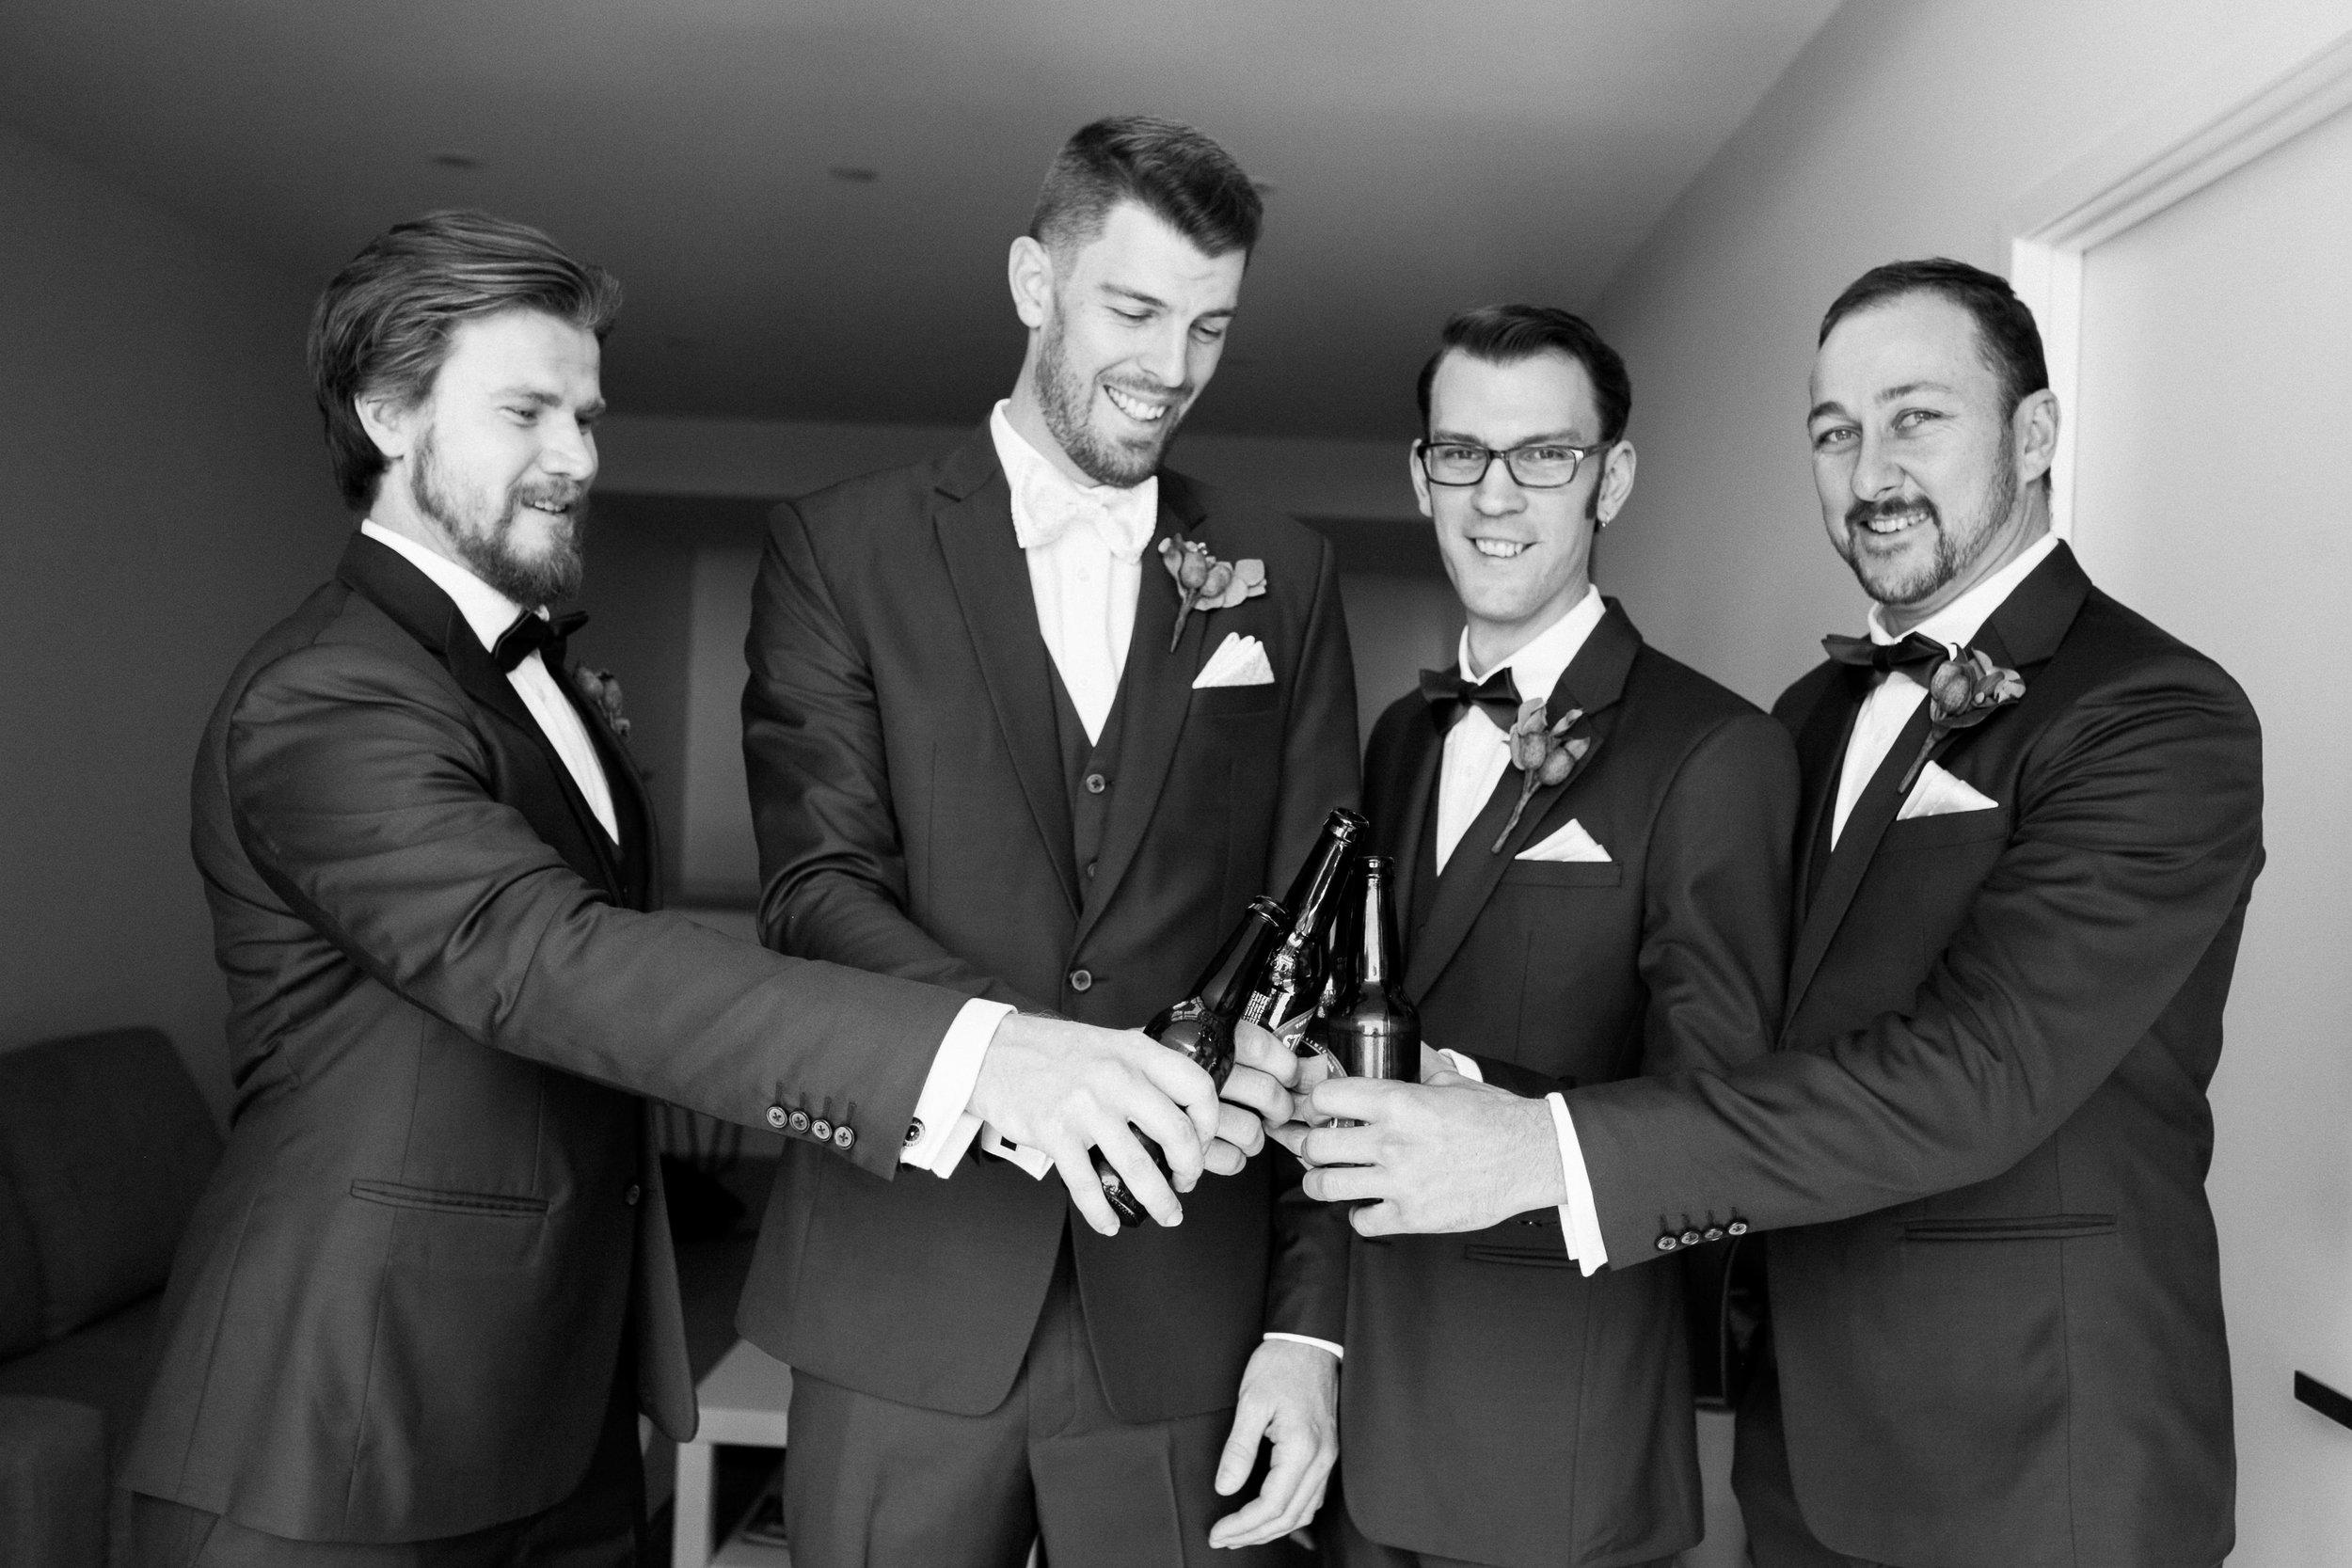 brisbane-city-wedding-photography-the-loft-1-18.jpg